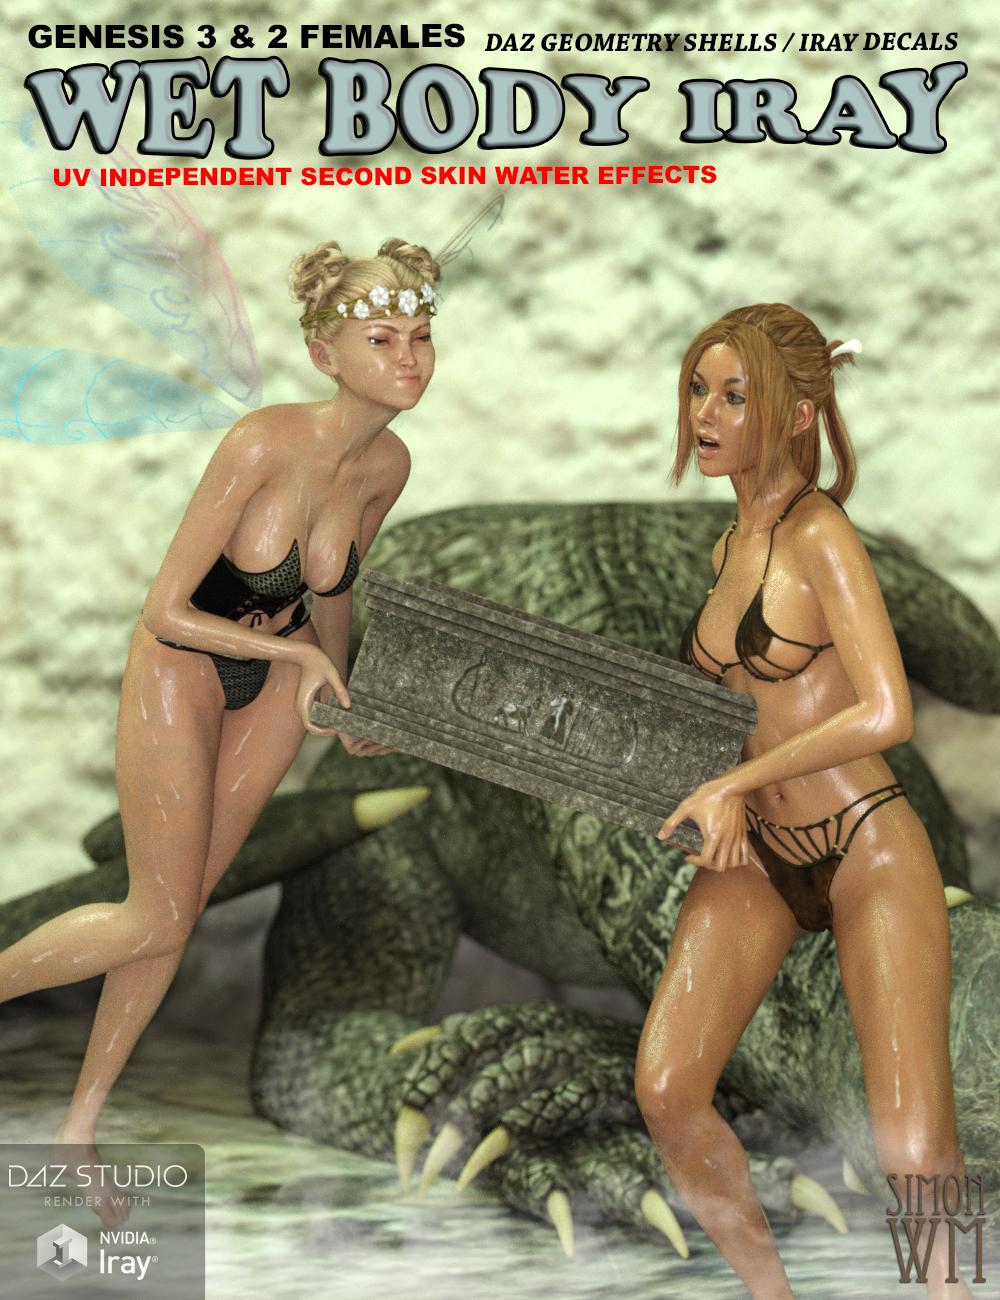 Wet Body Iray Bundle for Genesis 3 & 2 Female(s) by: SimonWM, 3D Models by Daz 3D